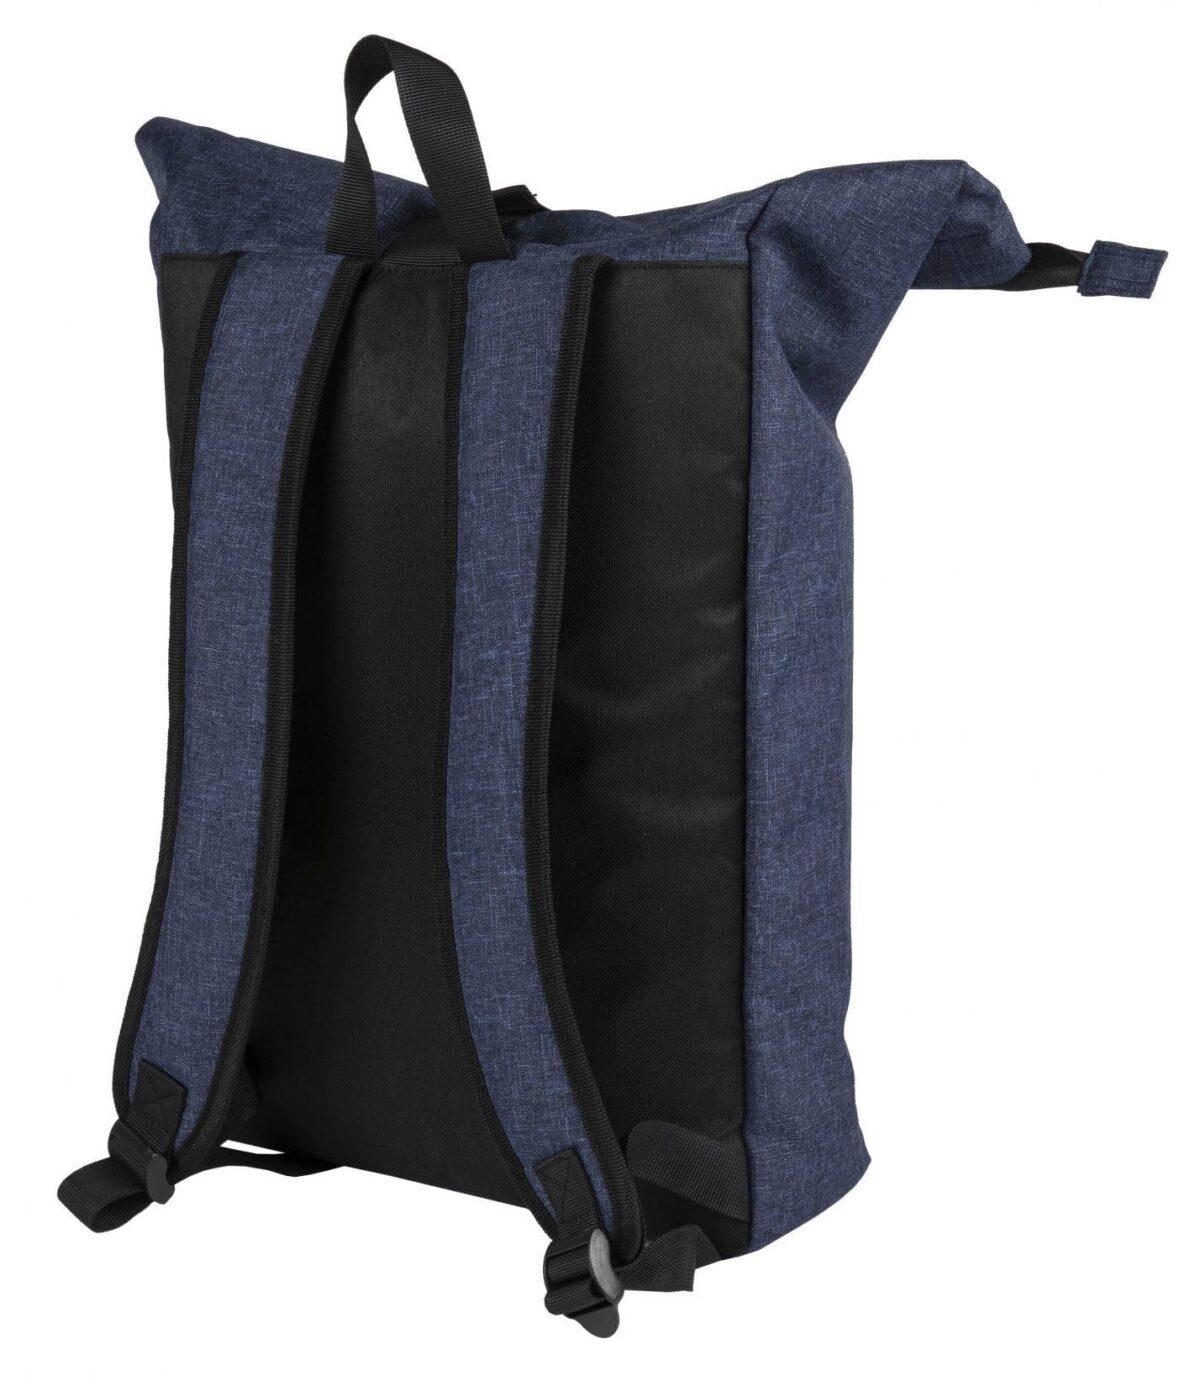 rPET Backpack Roll-top navy achterzijde - Yipp & Co